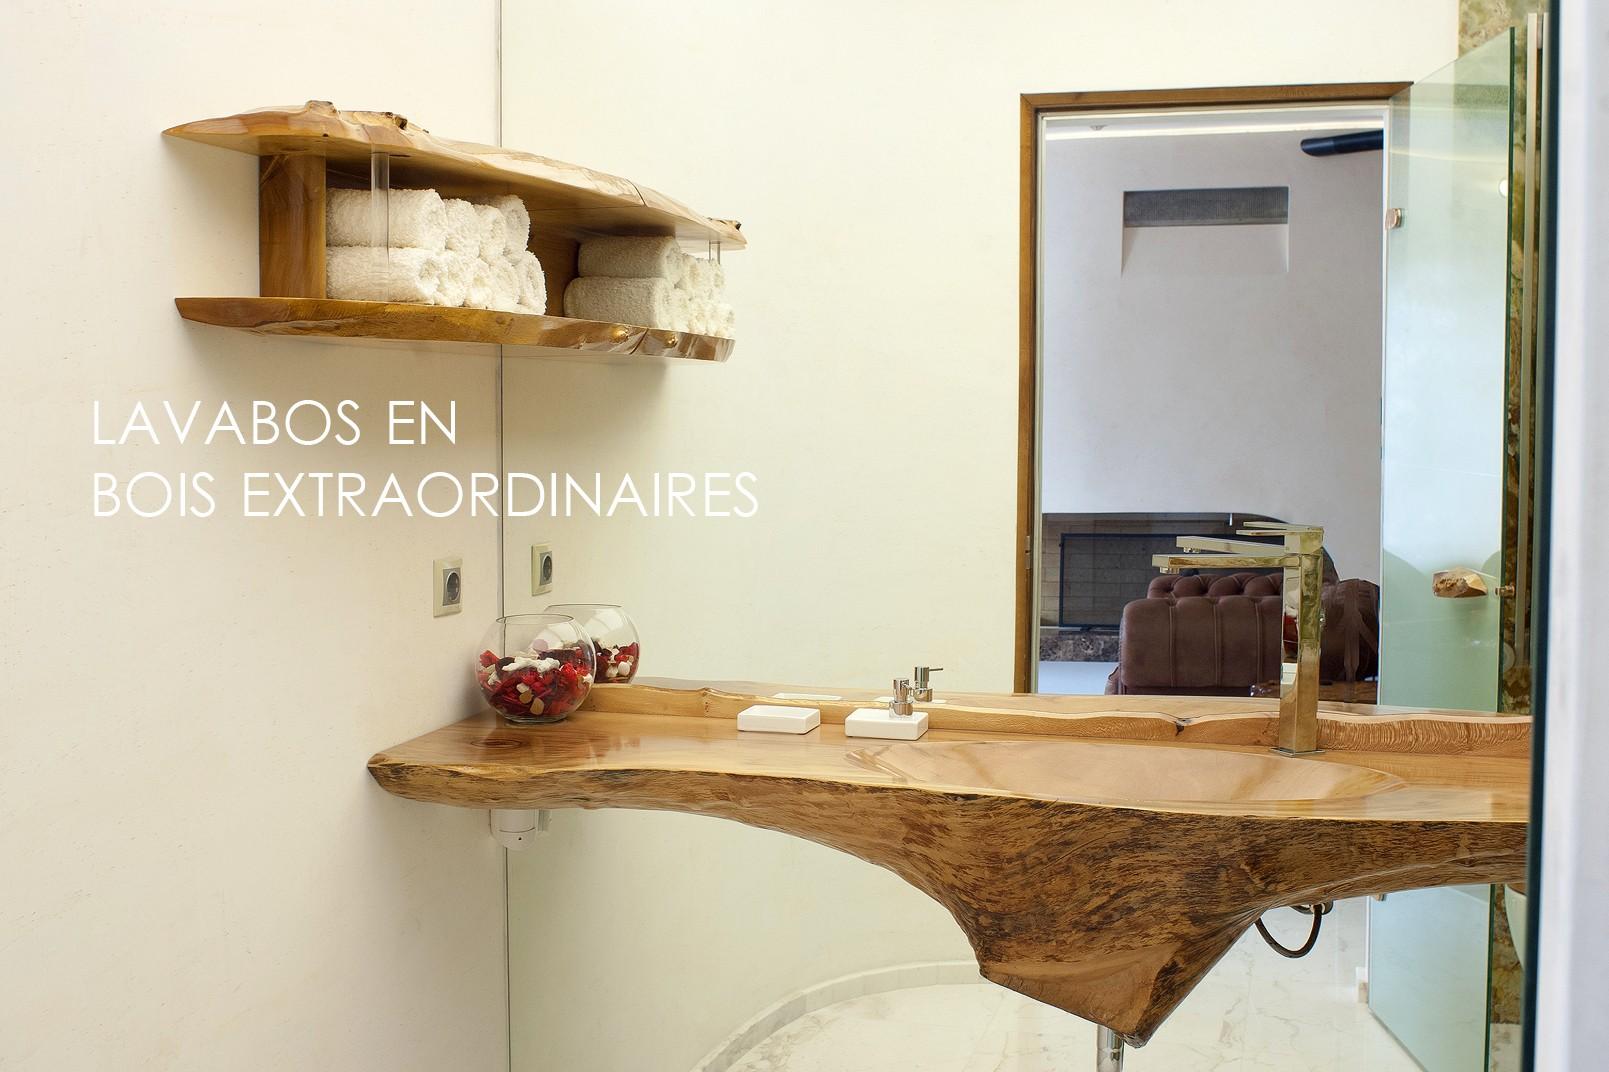 Lavabos en bois extraordinaires